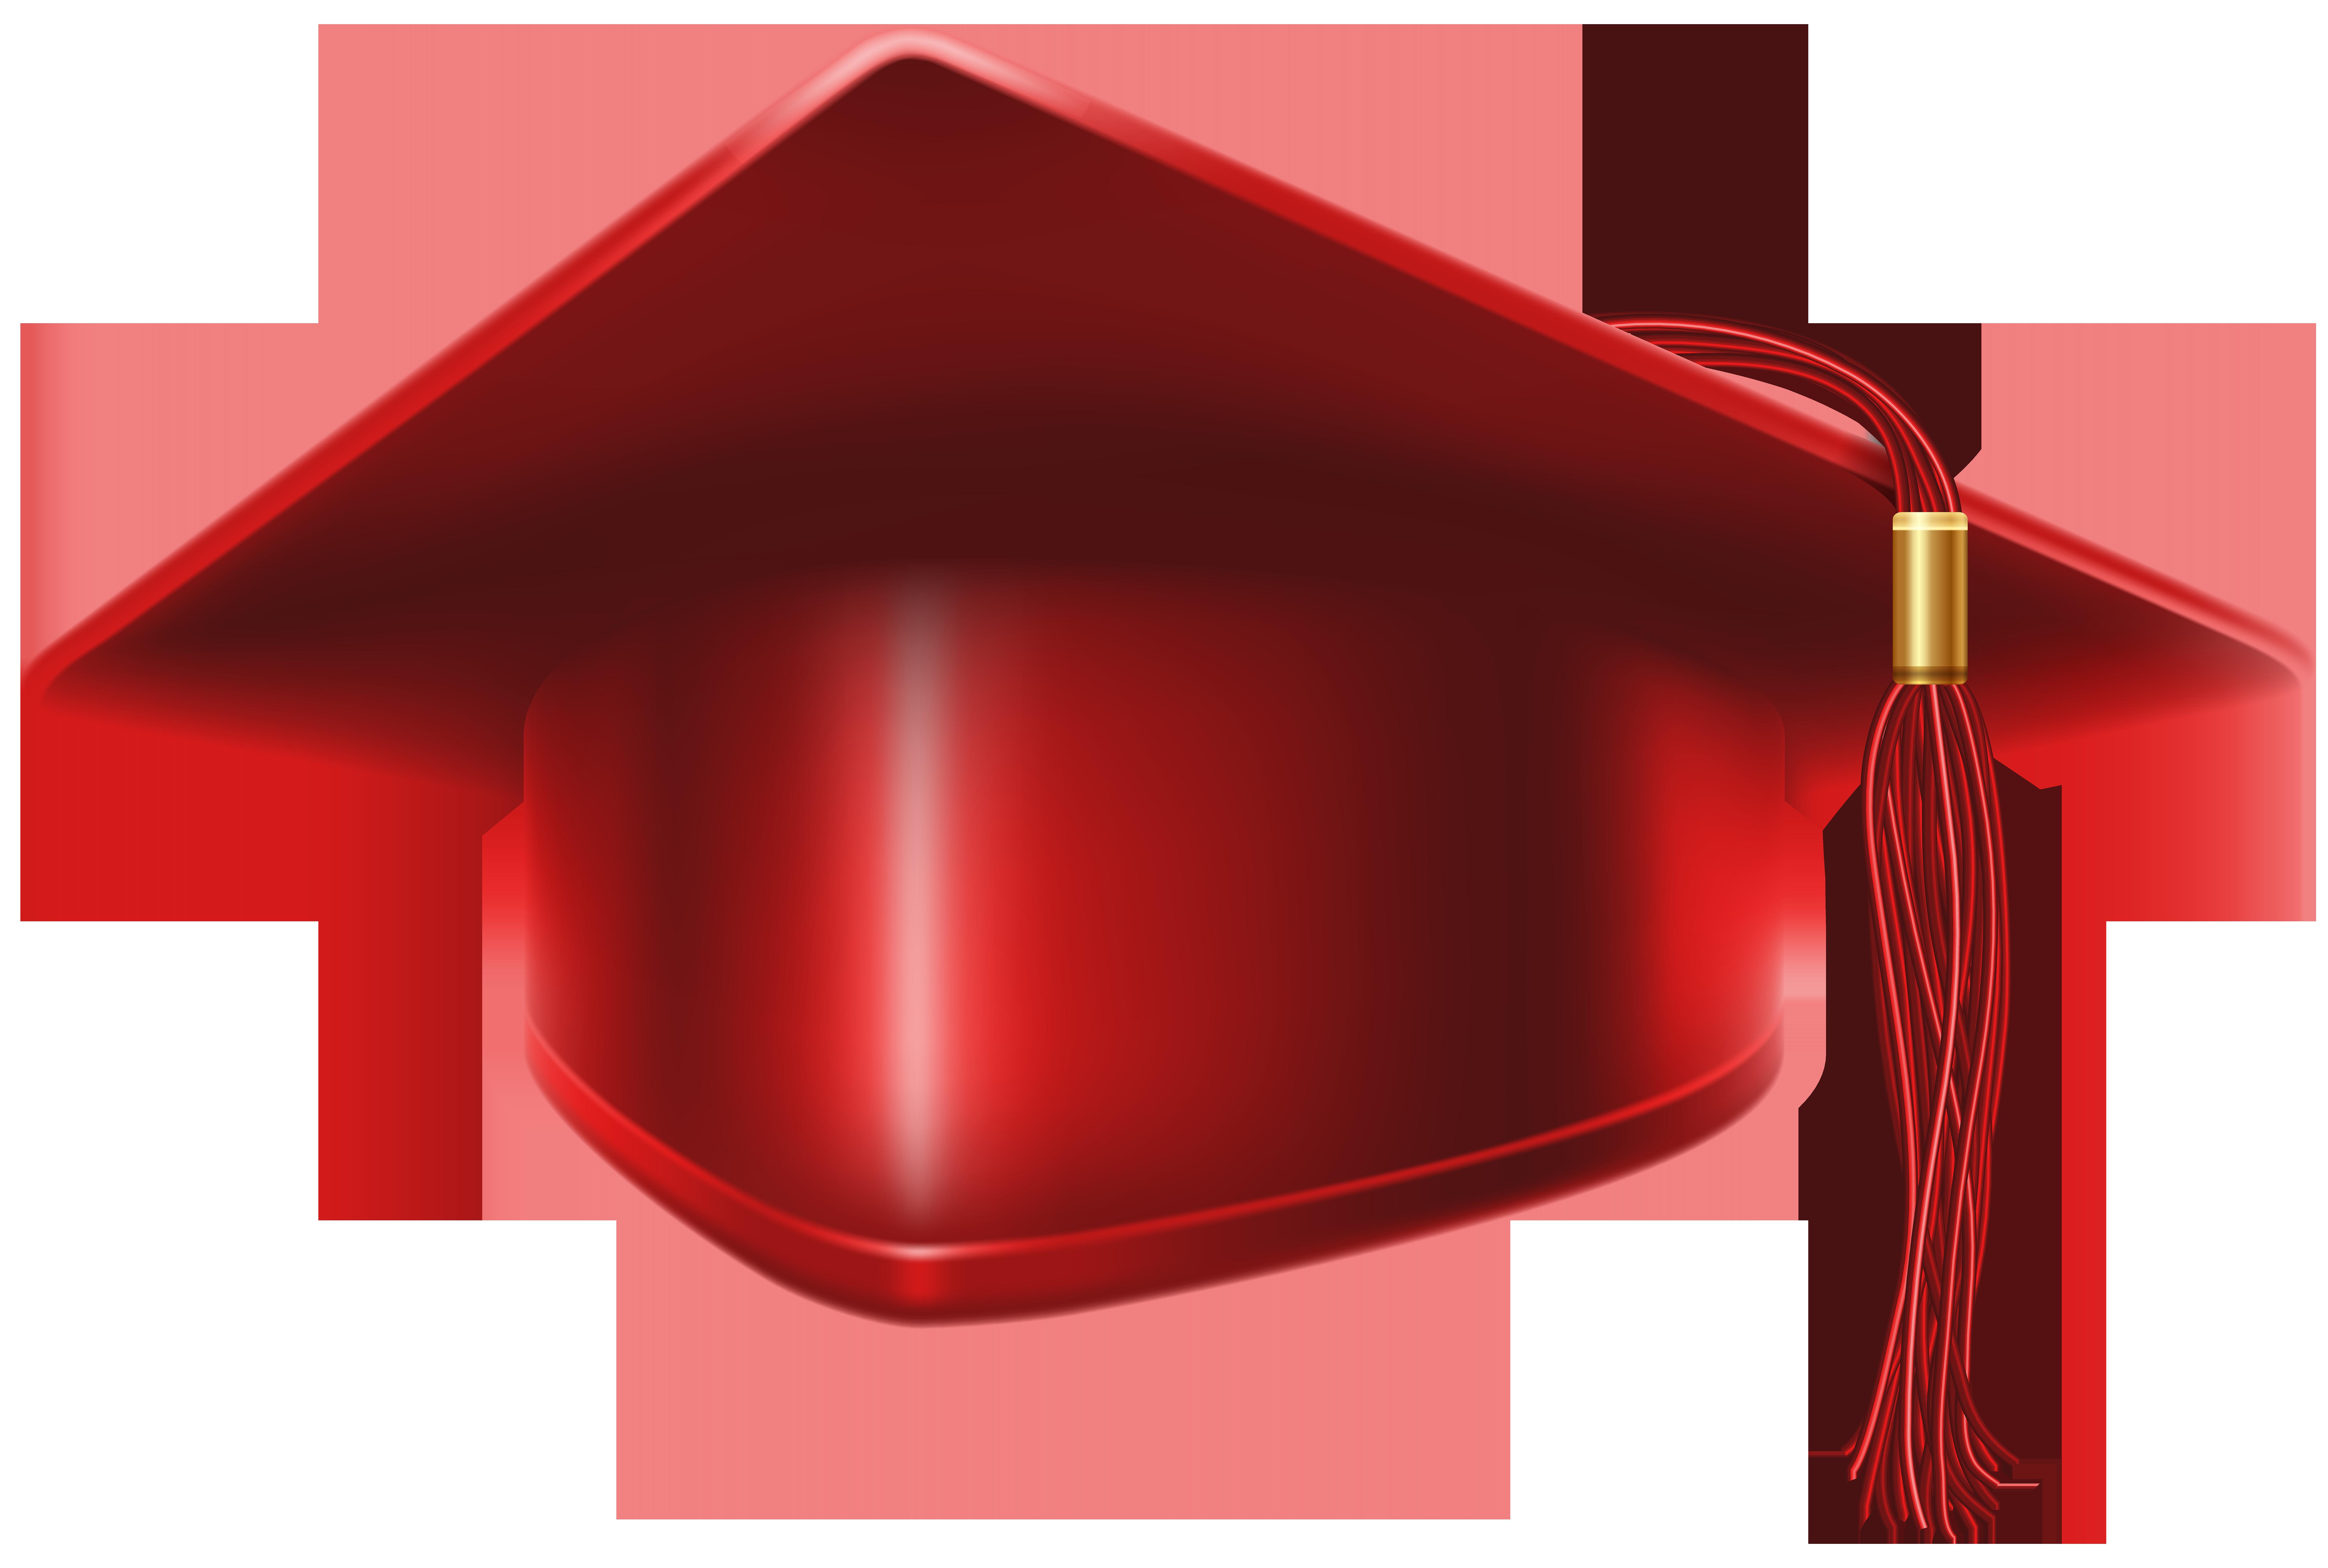 8000x5390 Red Graduation Cap Png Clip Art Imageu200b Gallery Yopriceville